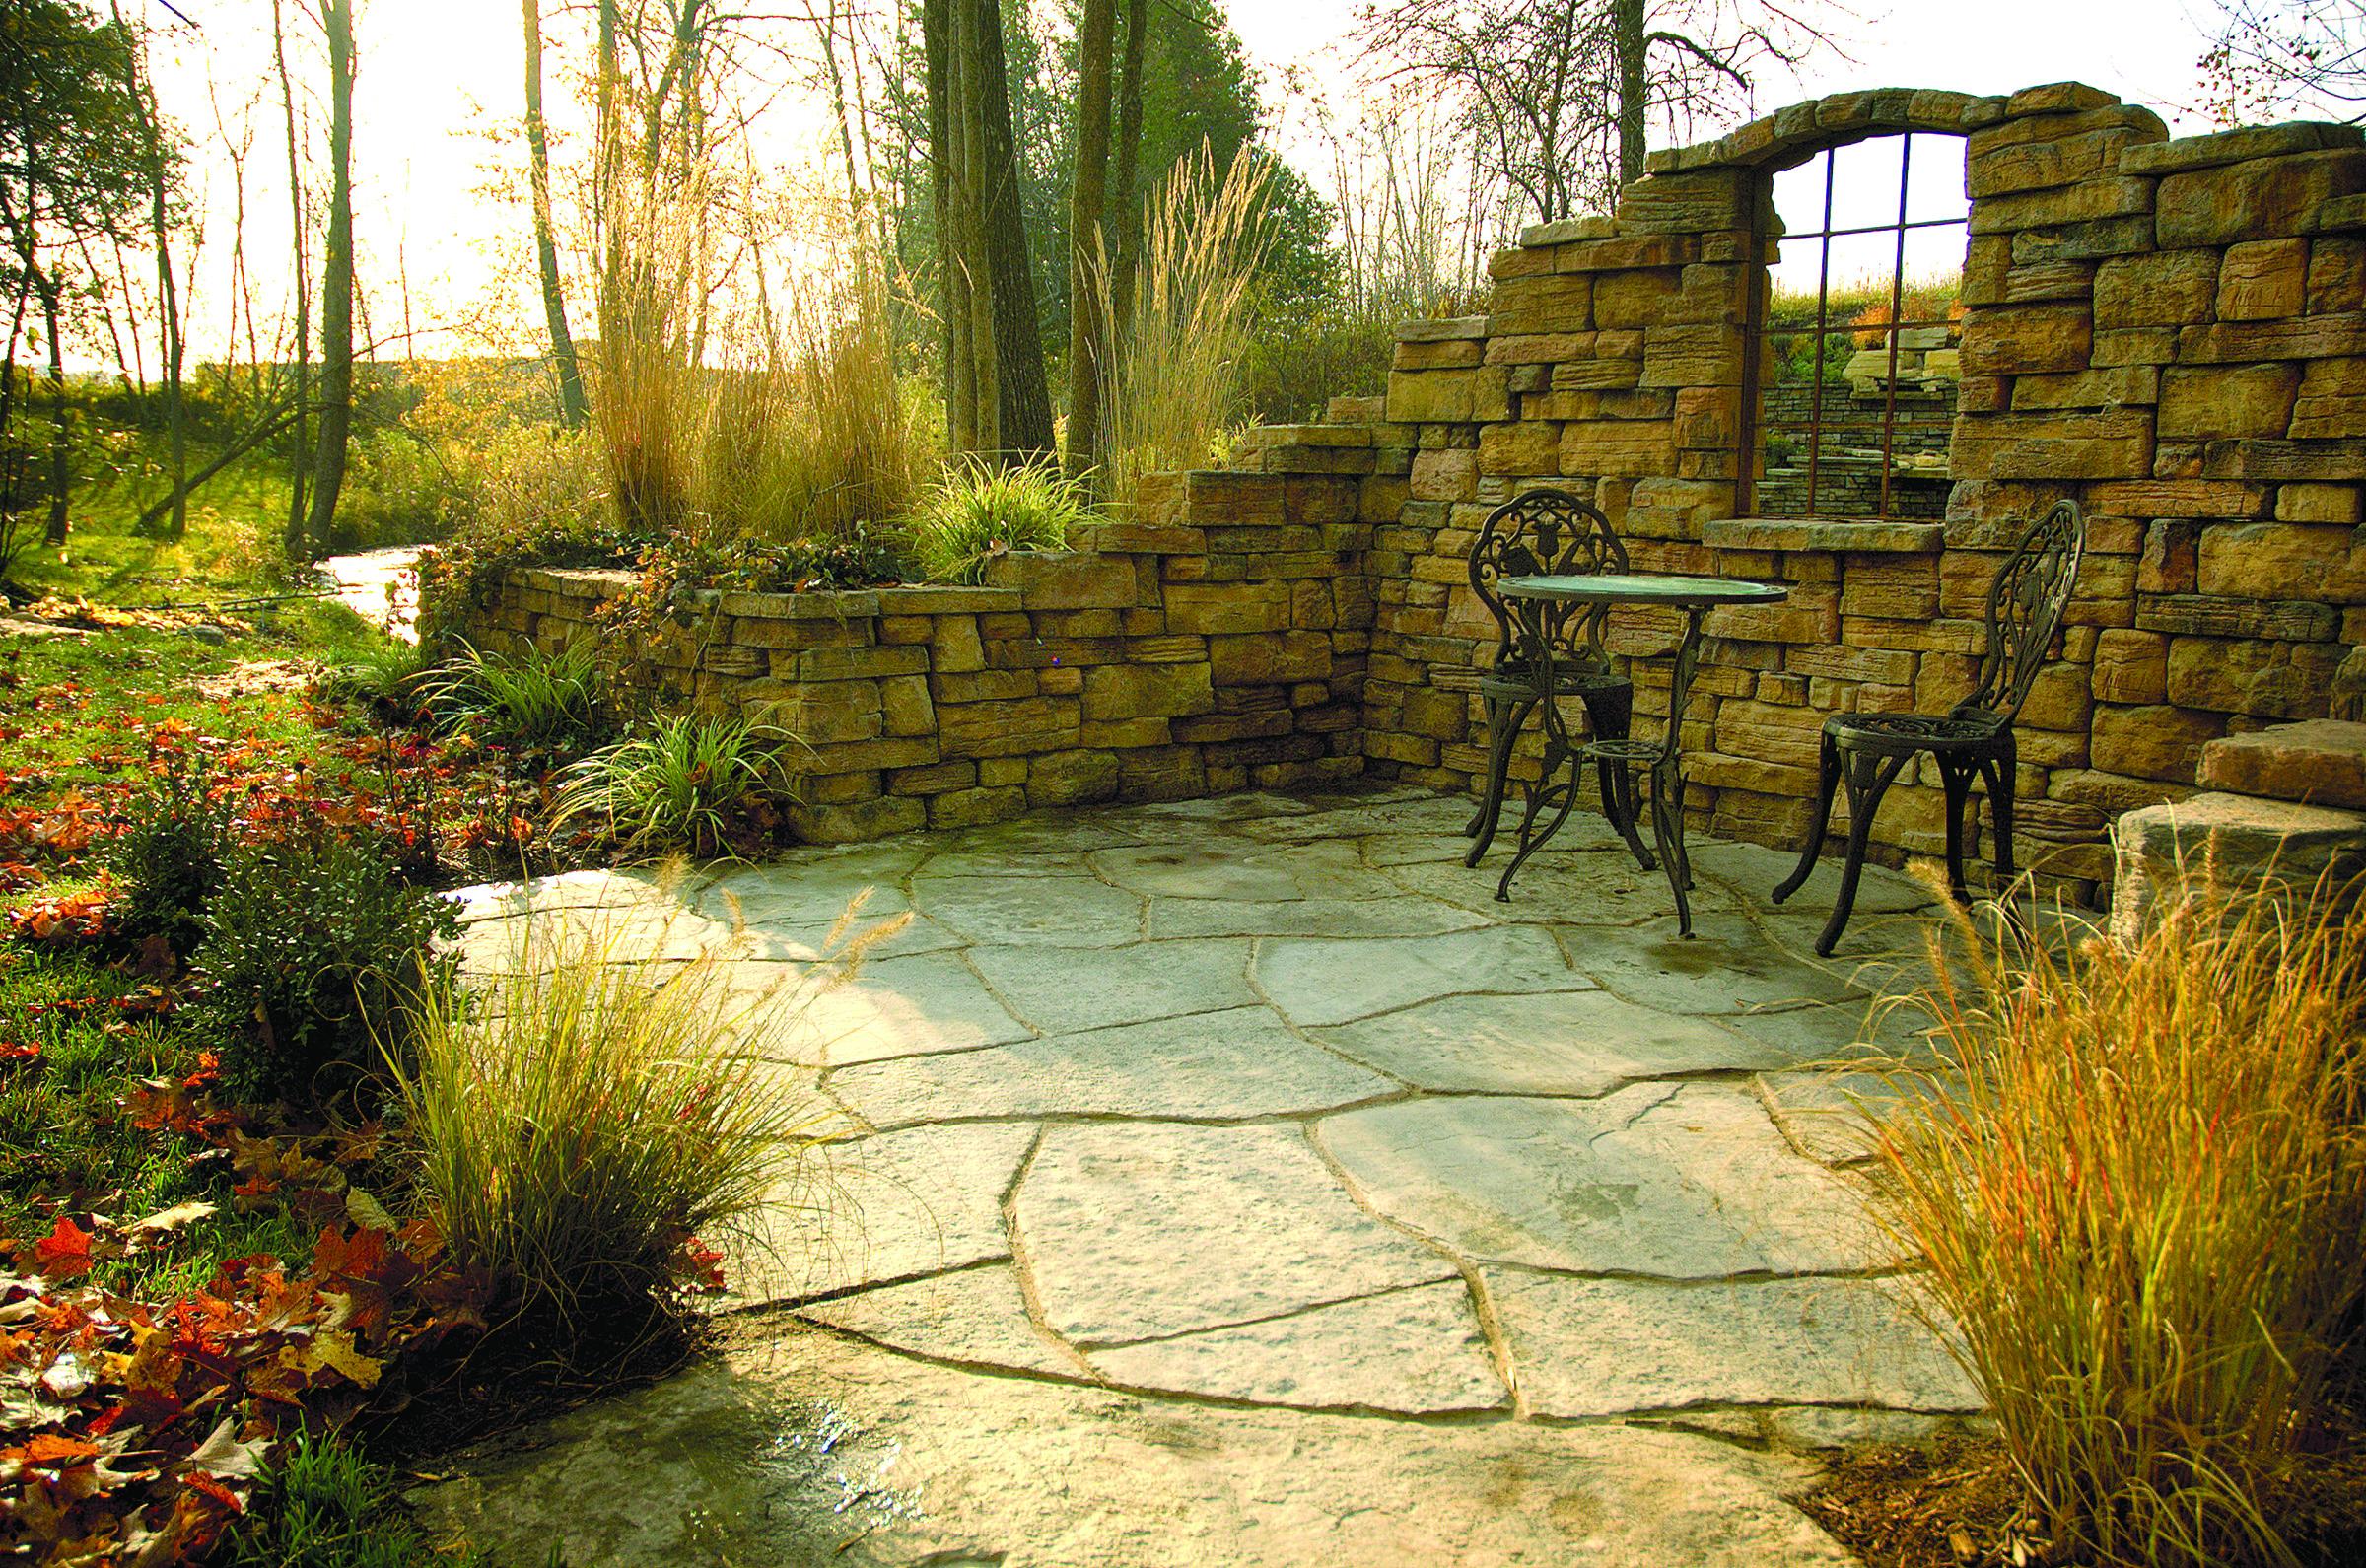 Concrete Paving | Fox Valley Stone & Brick